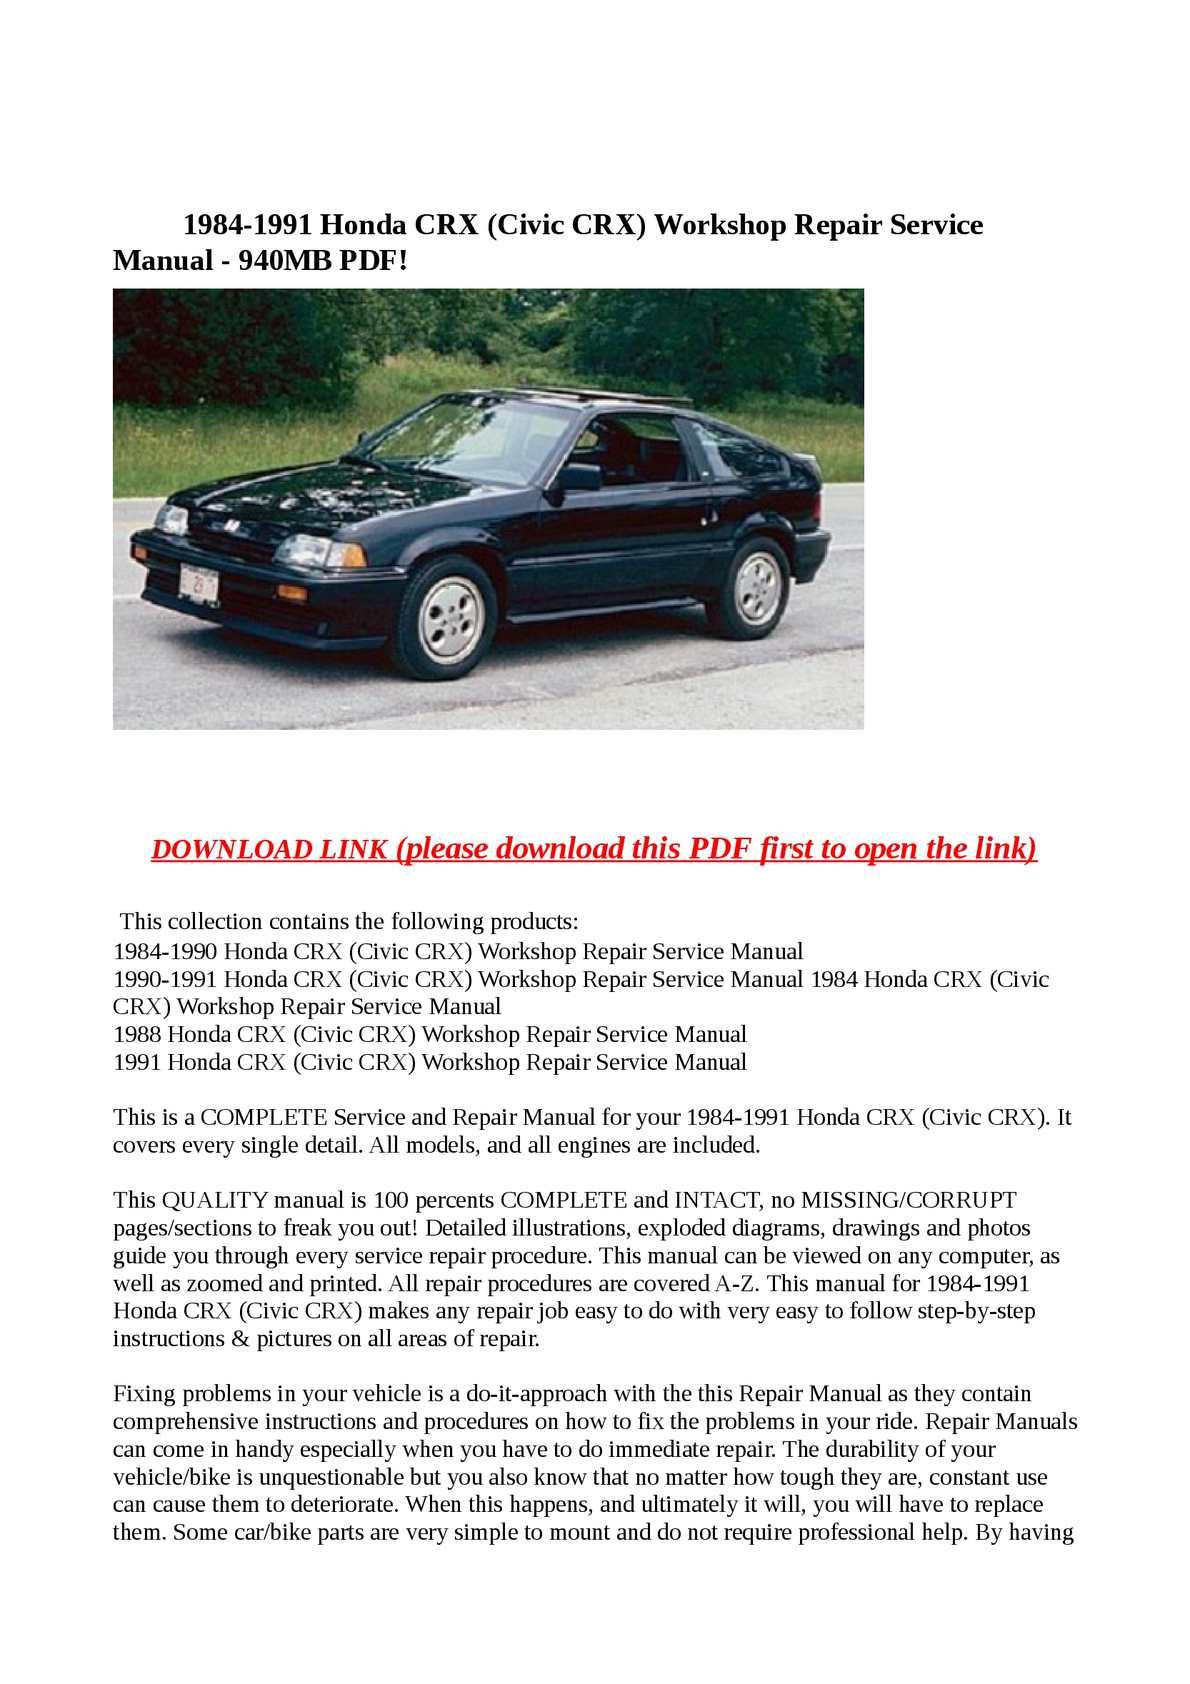 Calaméo - 1984-1991 Honda CRX (Civic CRX) Workshop Repair Service Manual -  940MB PDF!